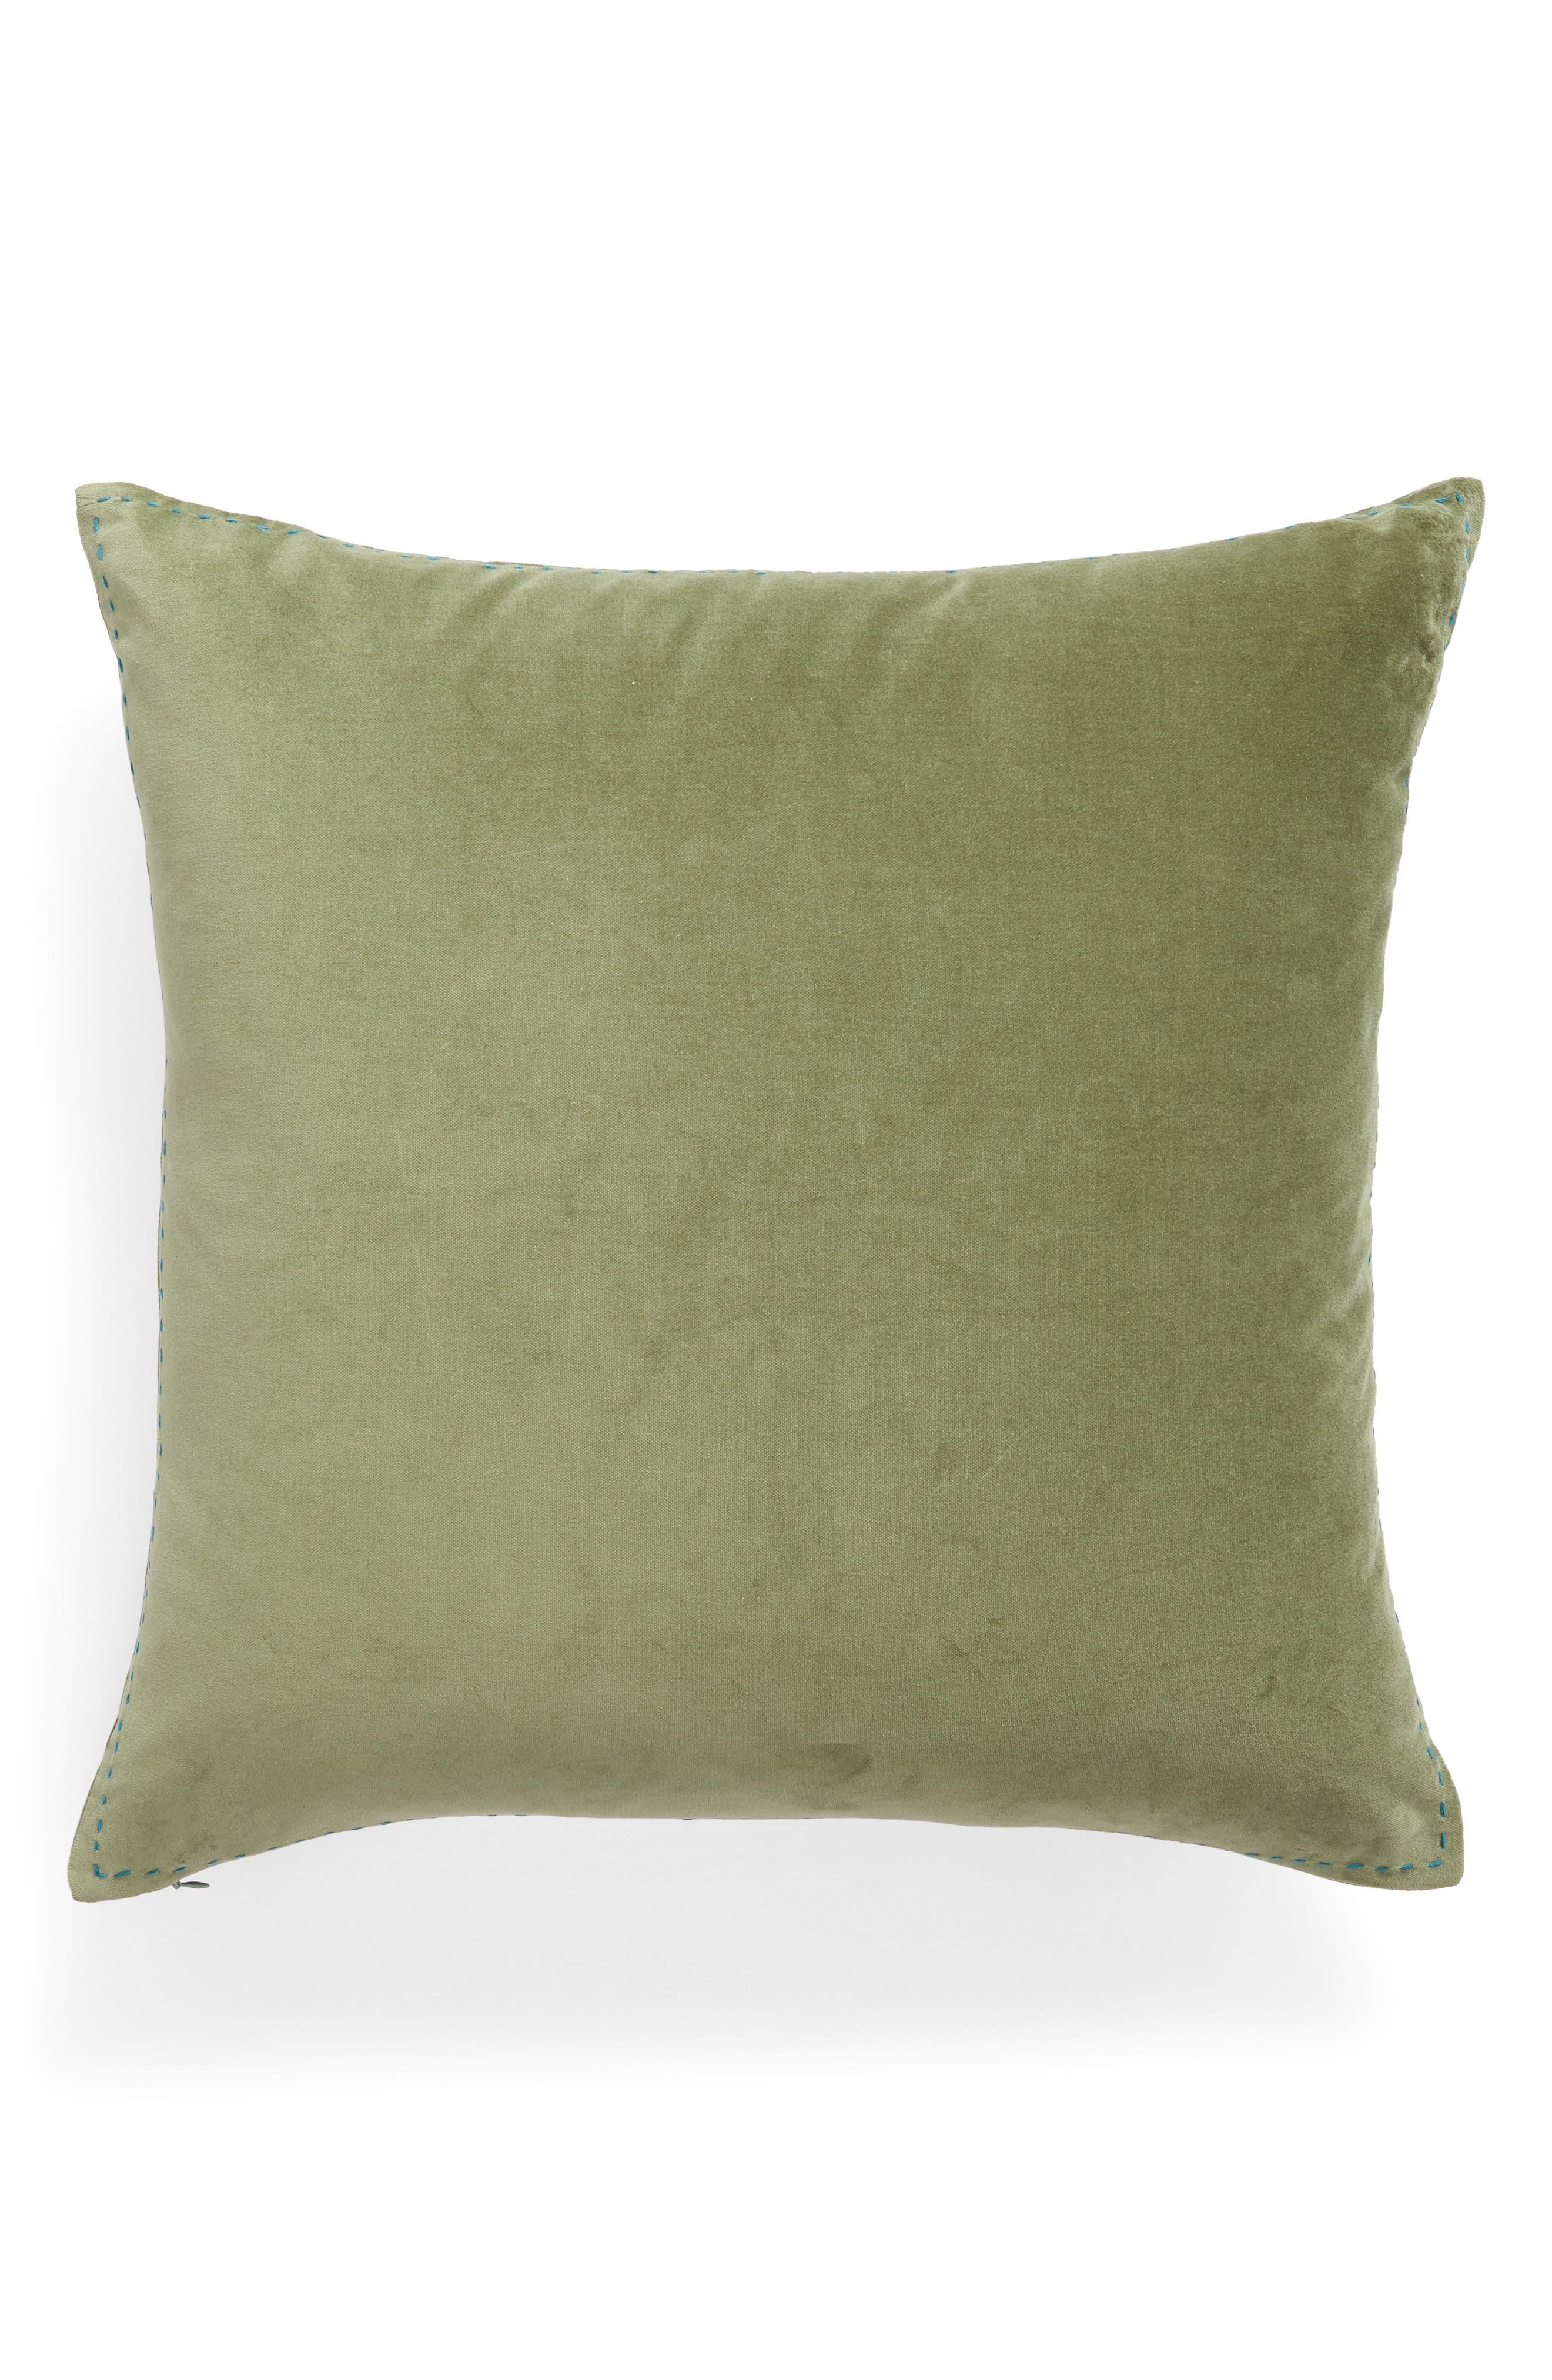 Ticking Border Accent Pillow,                             Main thumbnail 1, color,                             300